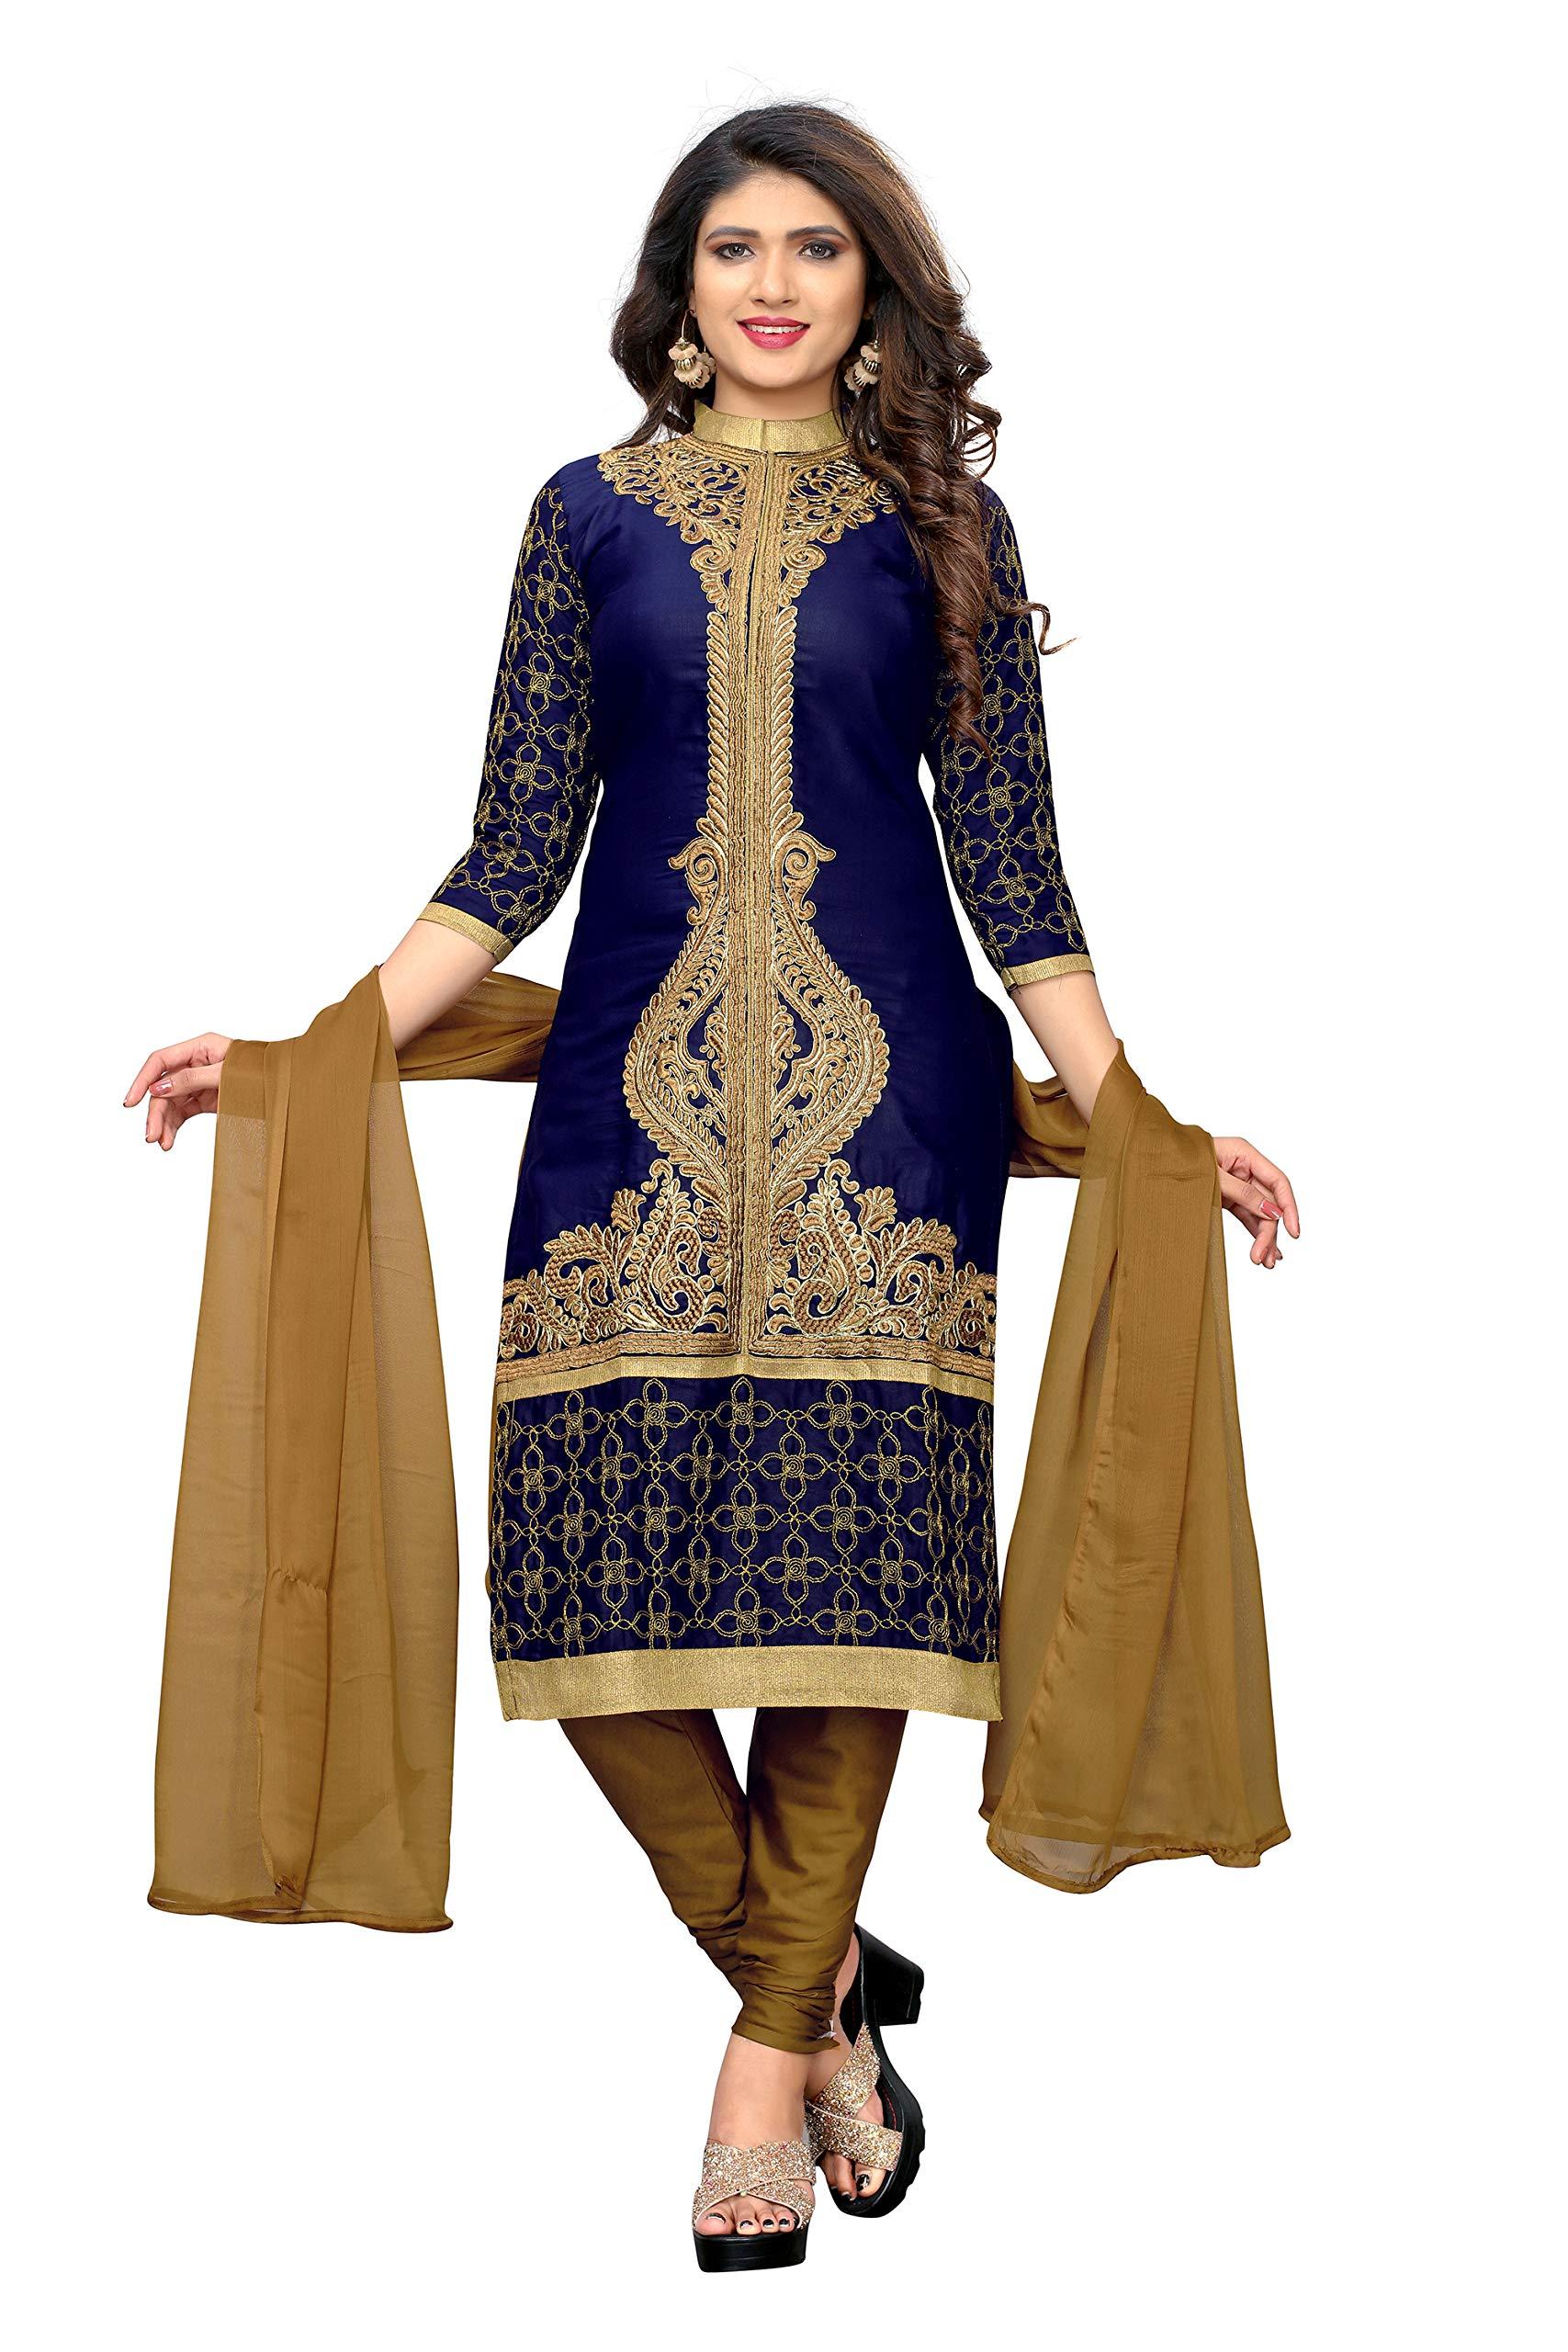 dc39ea7f2 ... Women s Semi Stitch Salwar Suit Material (salwar suit 106 blue). -70%.  🔍. Ethnic